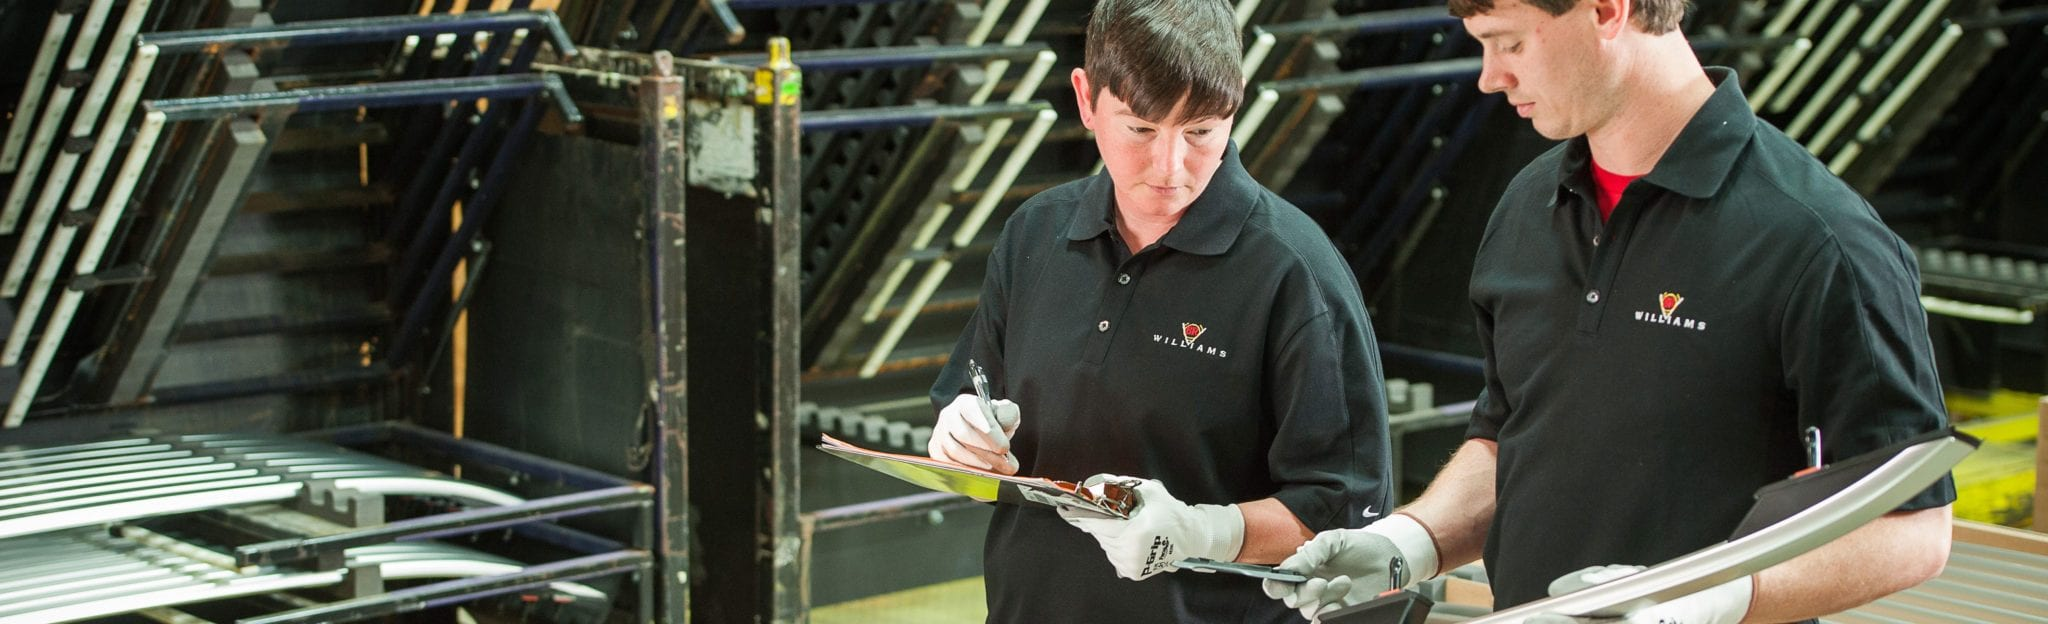 Automotive Industry Logistics Services in Alabama